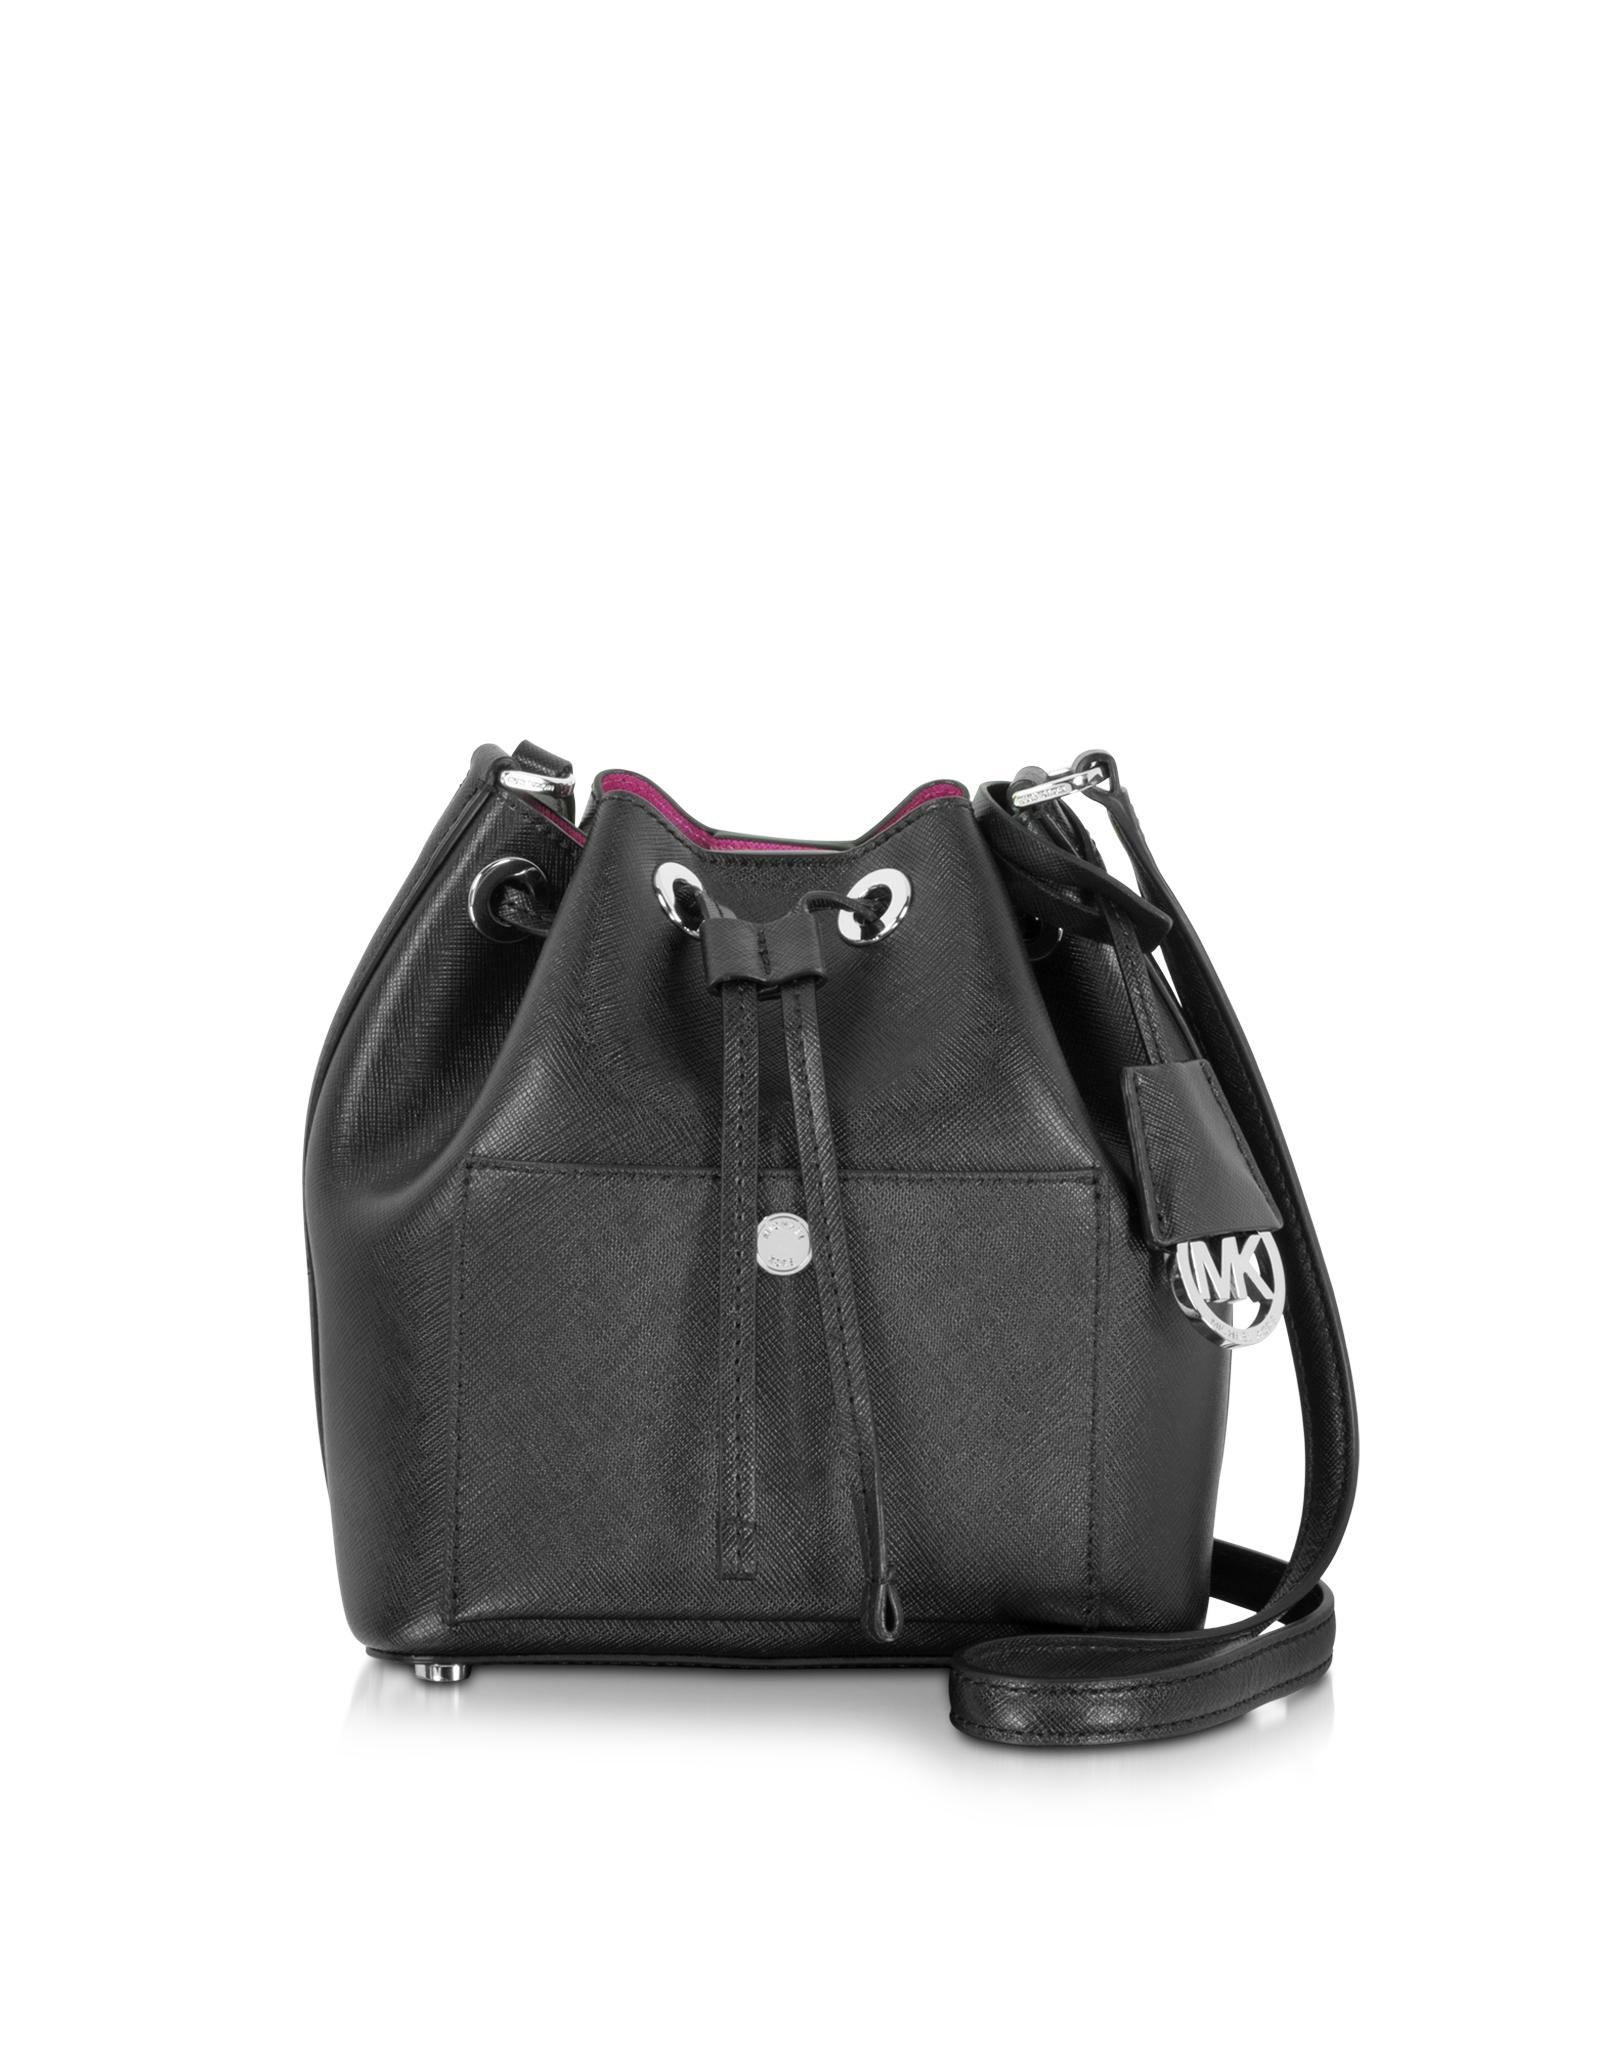 9cc4c5171f1c ... Michael Kors Greenwich Saffiano-Leather Bucket Bag in Black ...